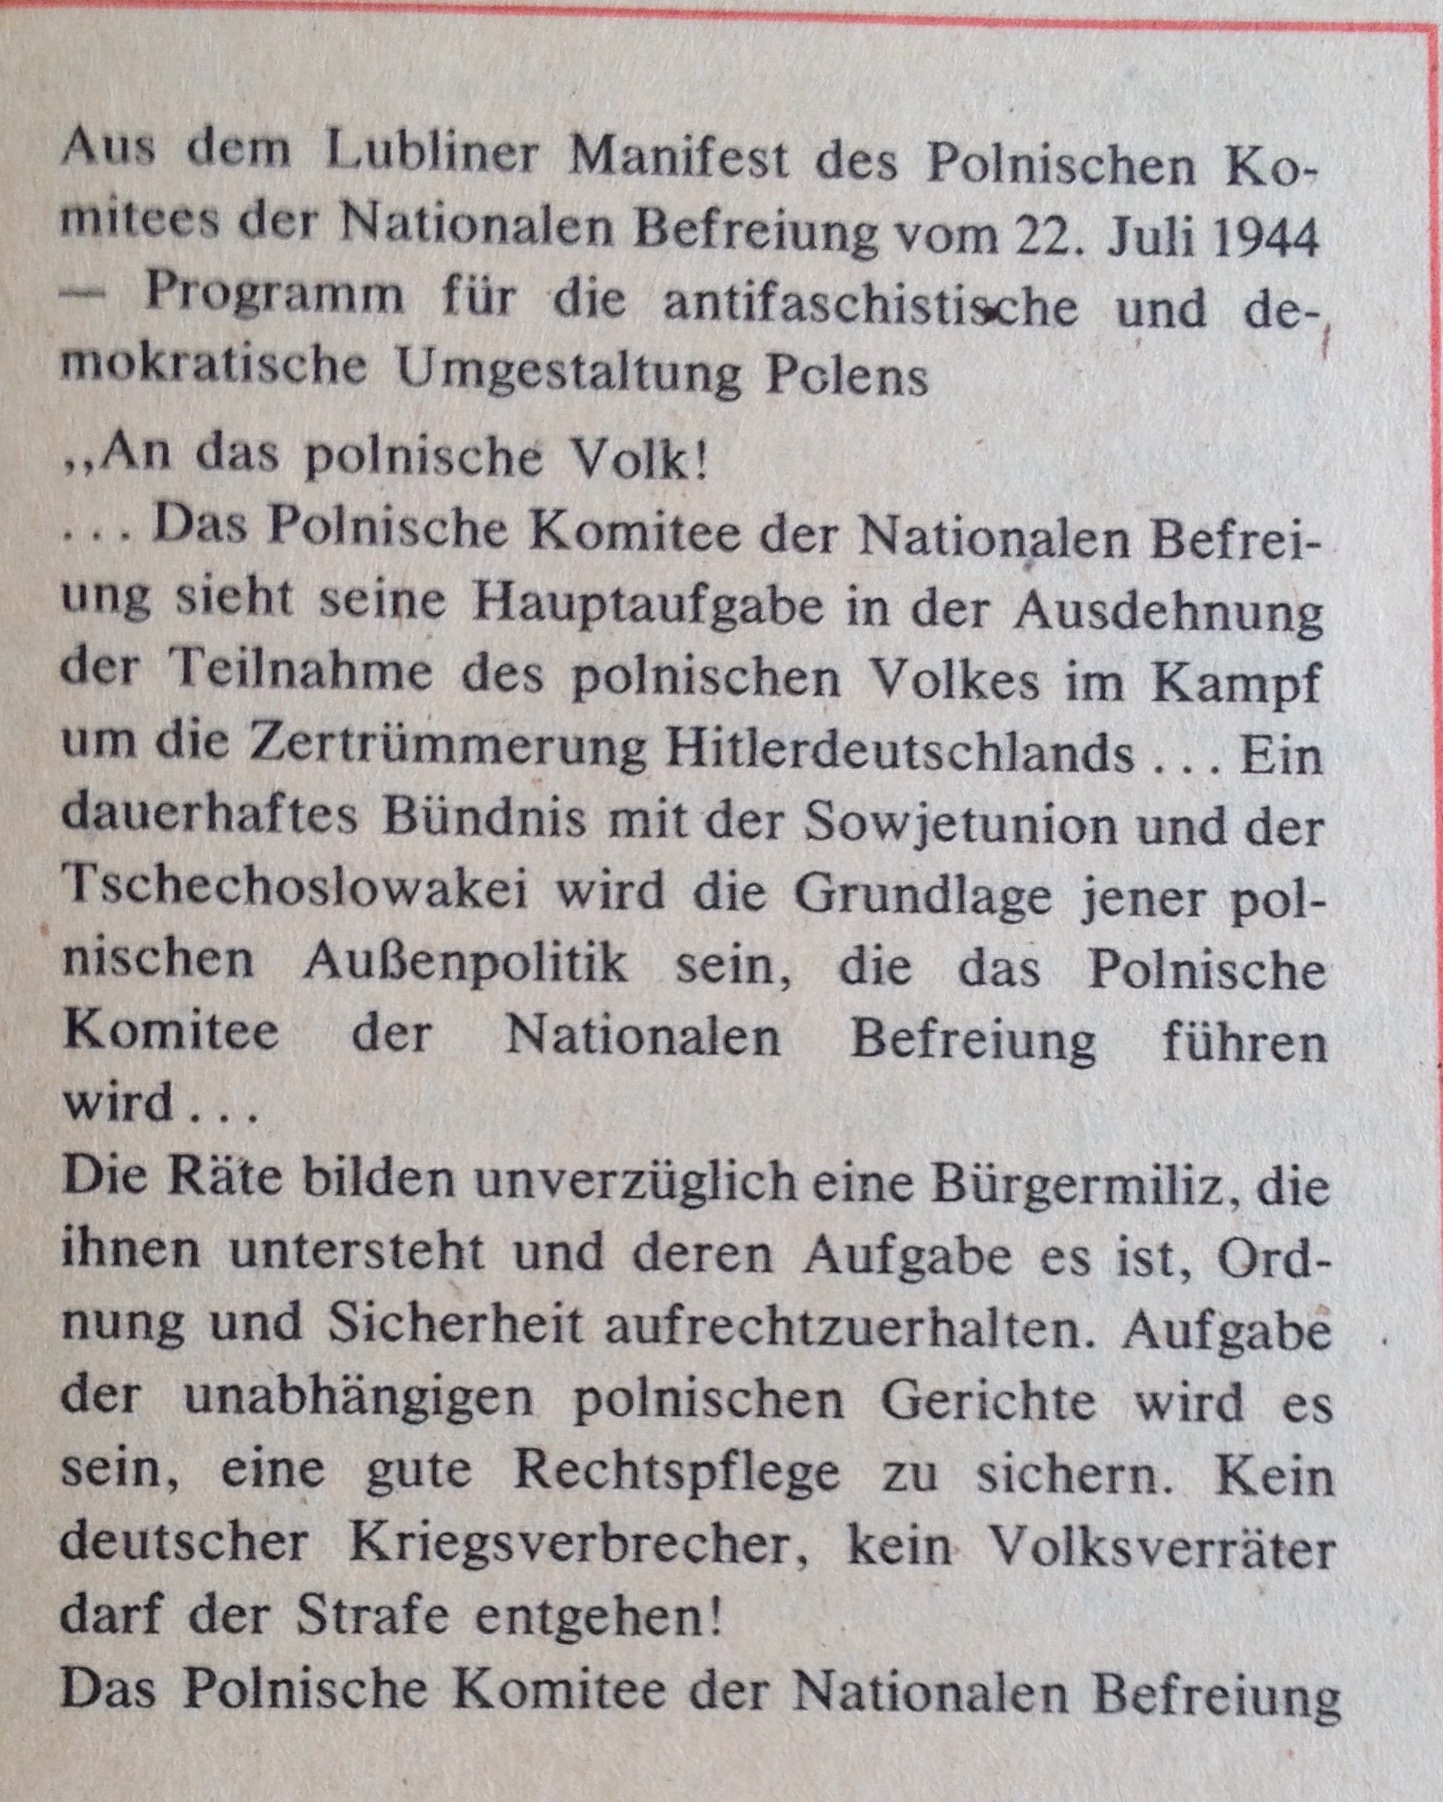 Lubliner Manifest Text 1